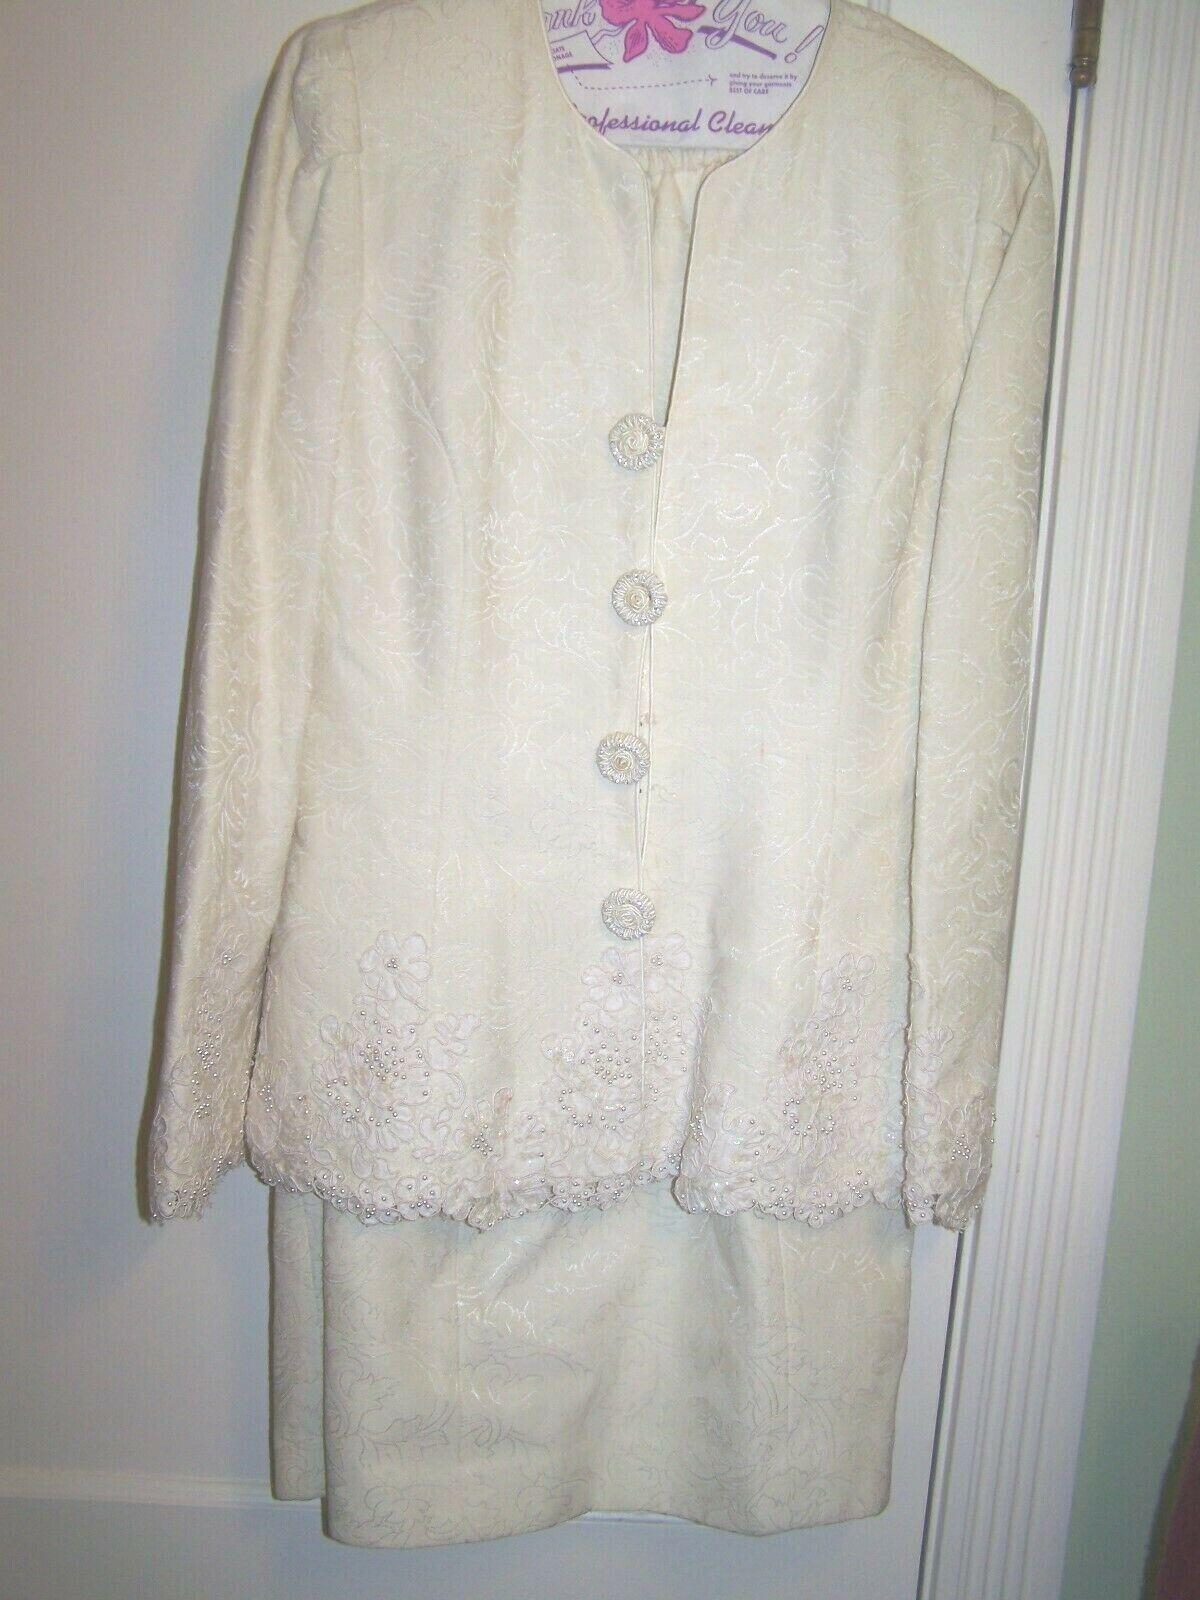 Karen Lawrence by Matthew Cream Skirt Suit Blazer Wedding Formal Size 10 RS11